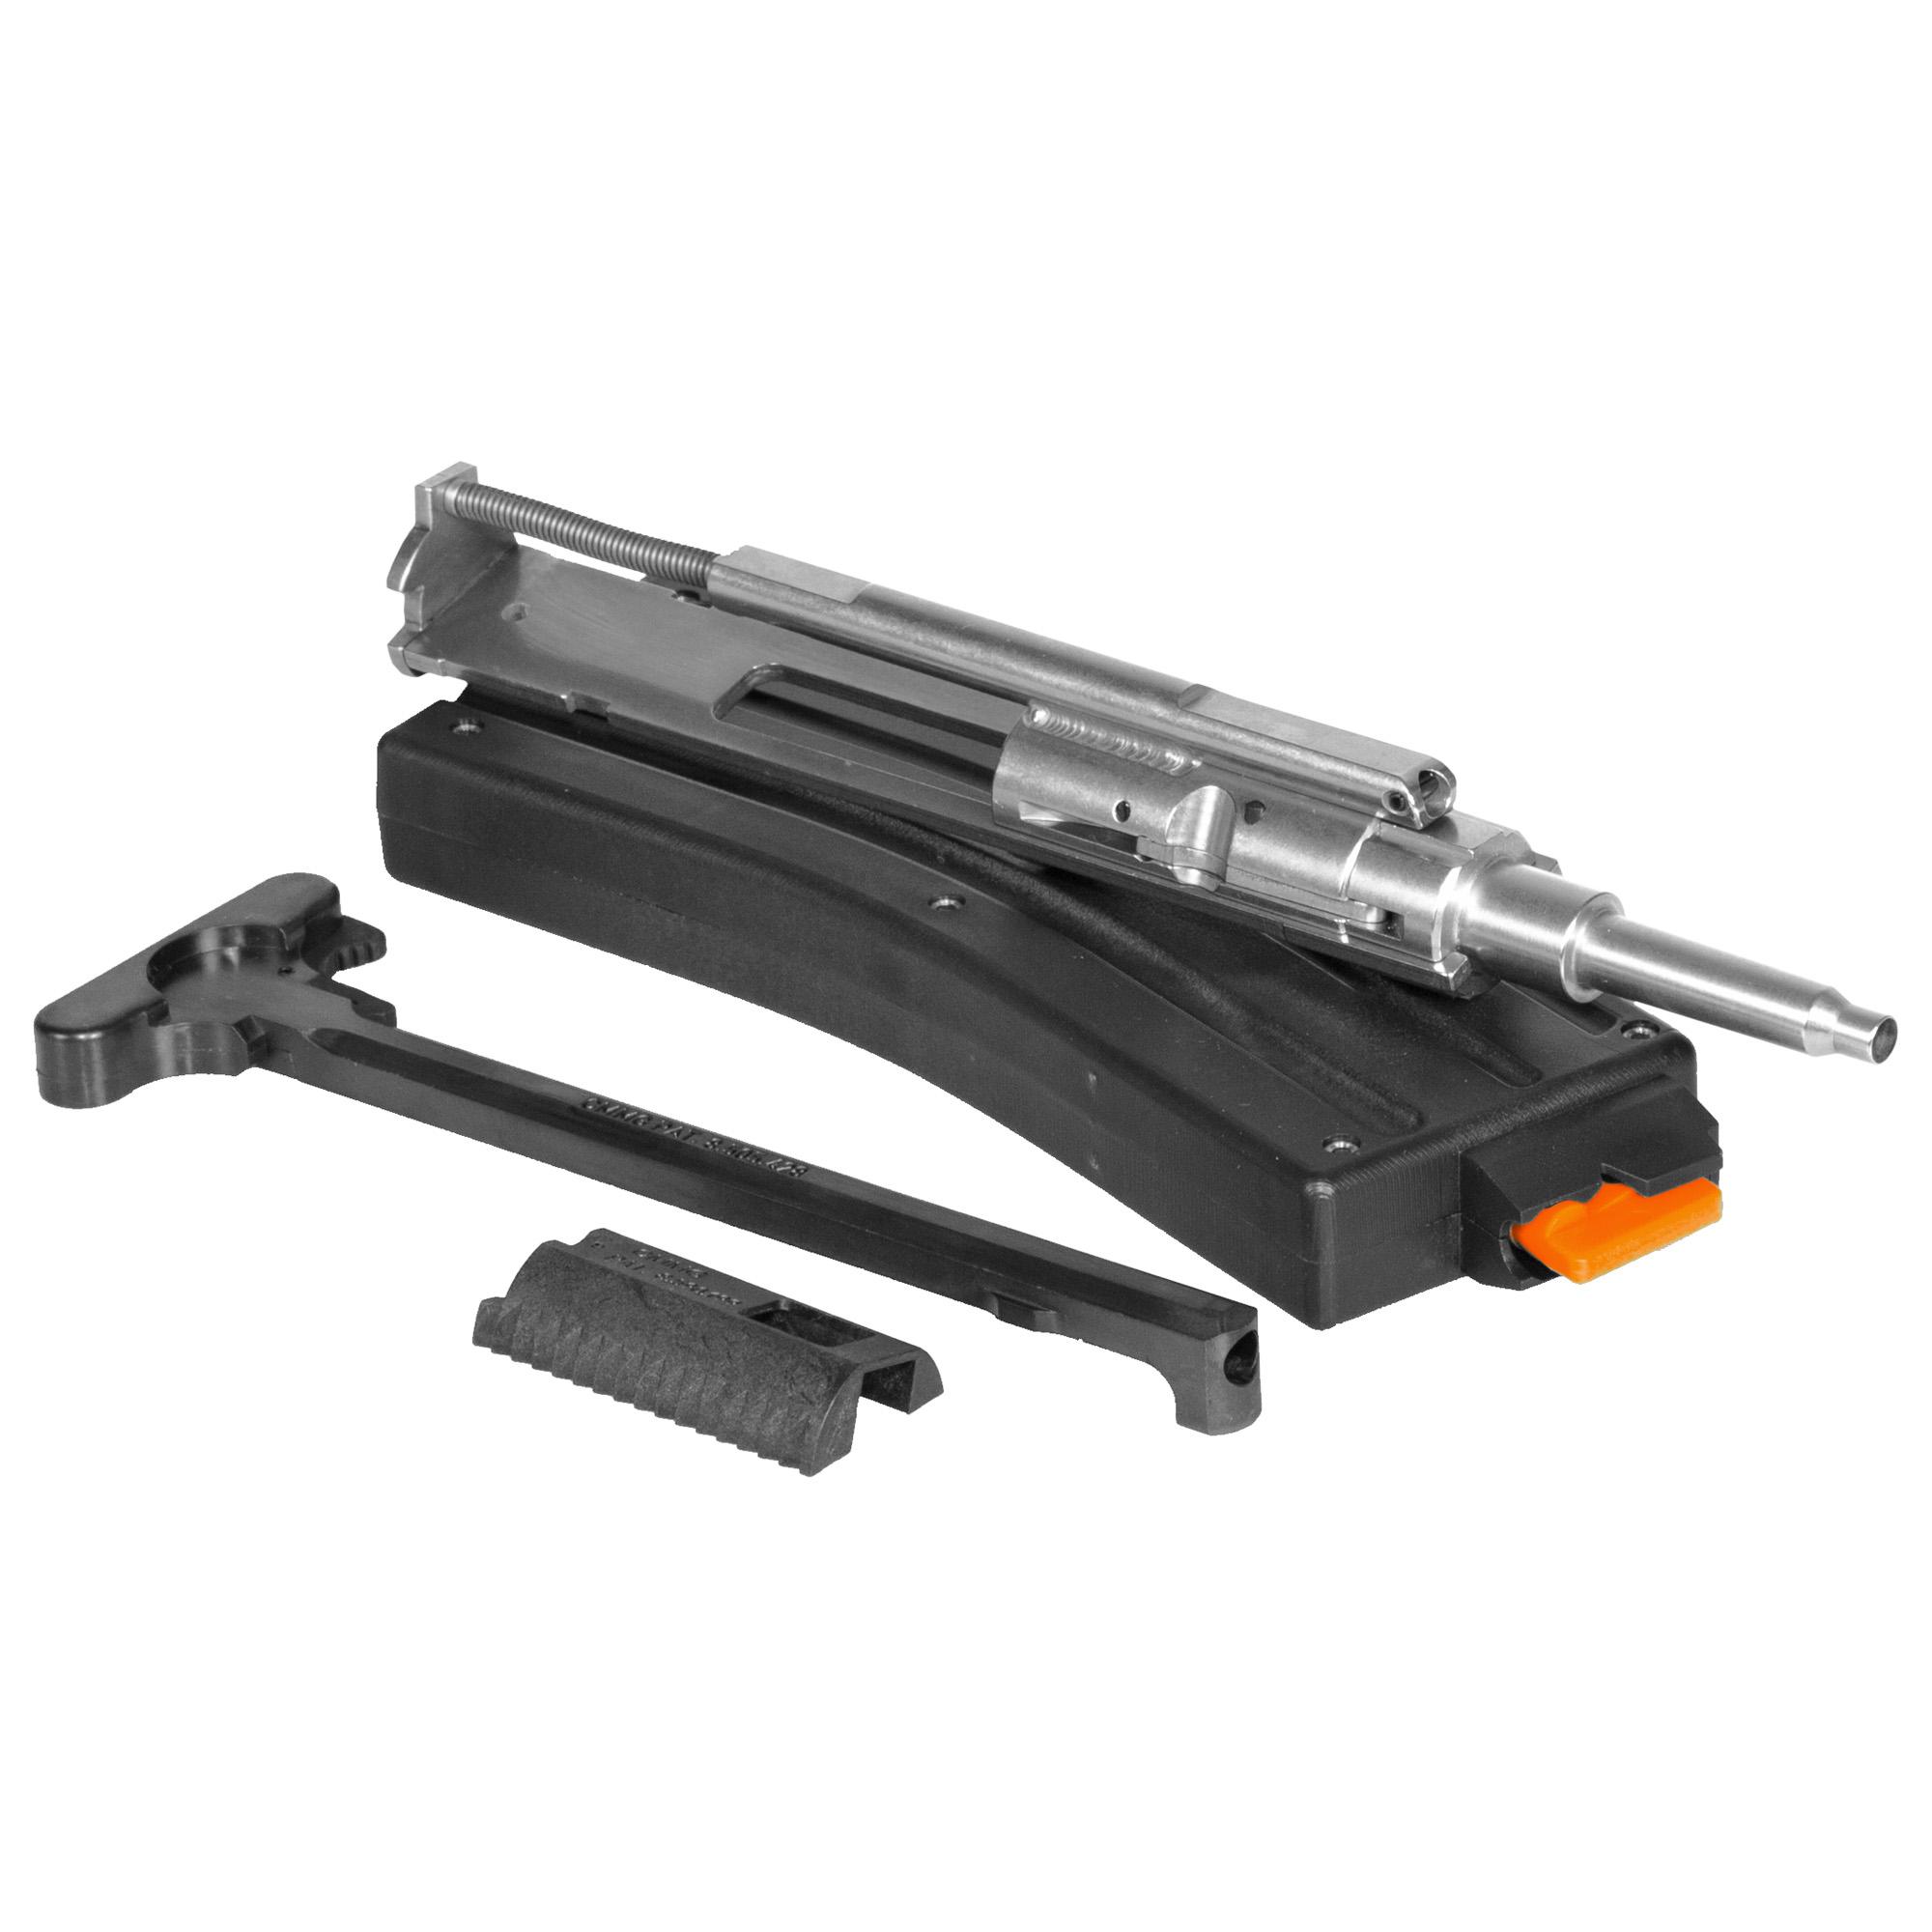 CMMG 22LR AR Conversion Kit Echo With 25 Round Magazine